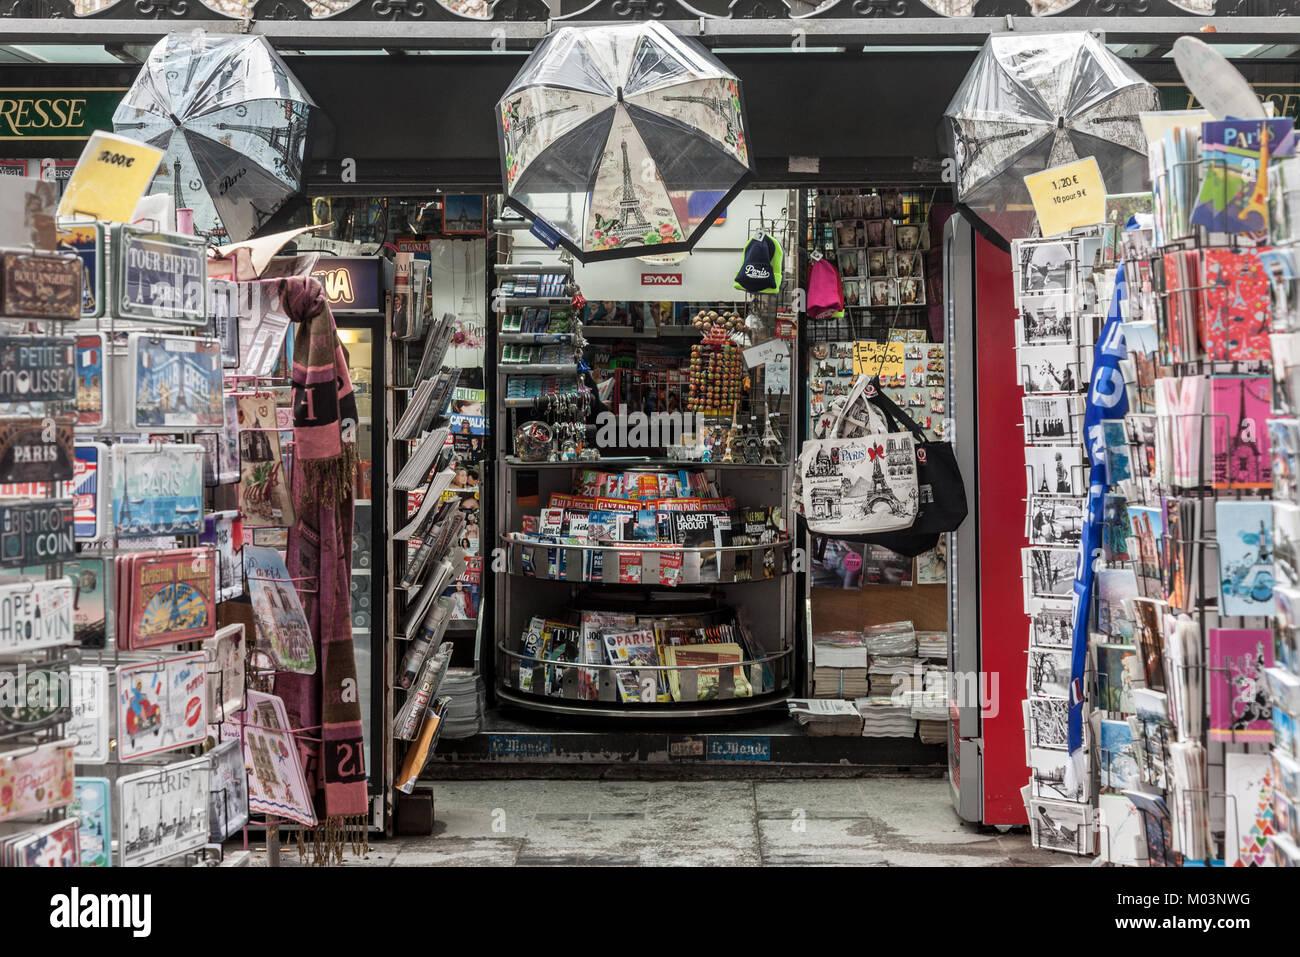 PARIS, FRANCE - DECEMBER 20, 2017: Souvenir Shop on the Paris avenue of Champs Elysees, in a kiosk, displaying various - Stock Image